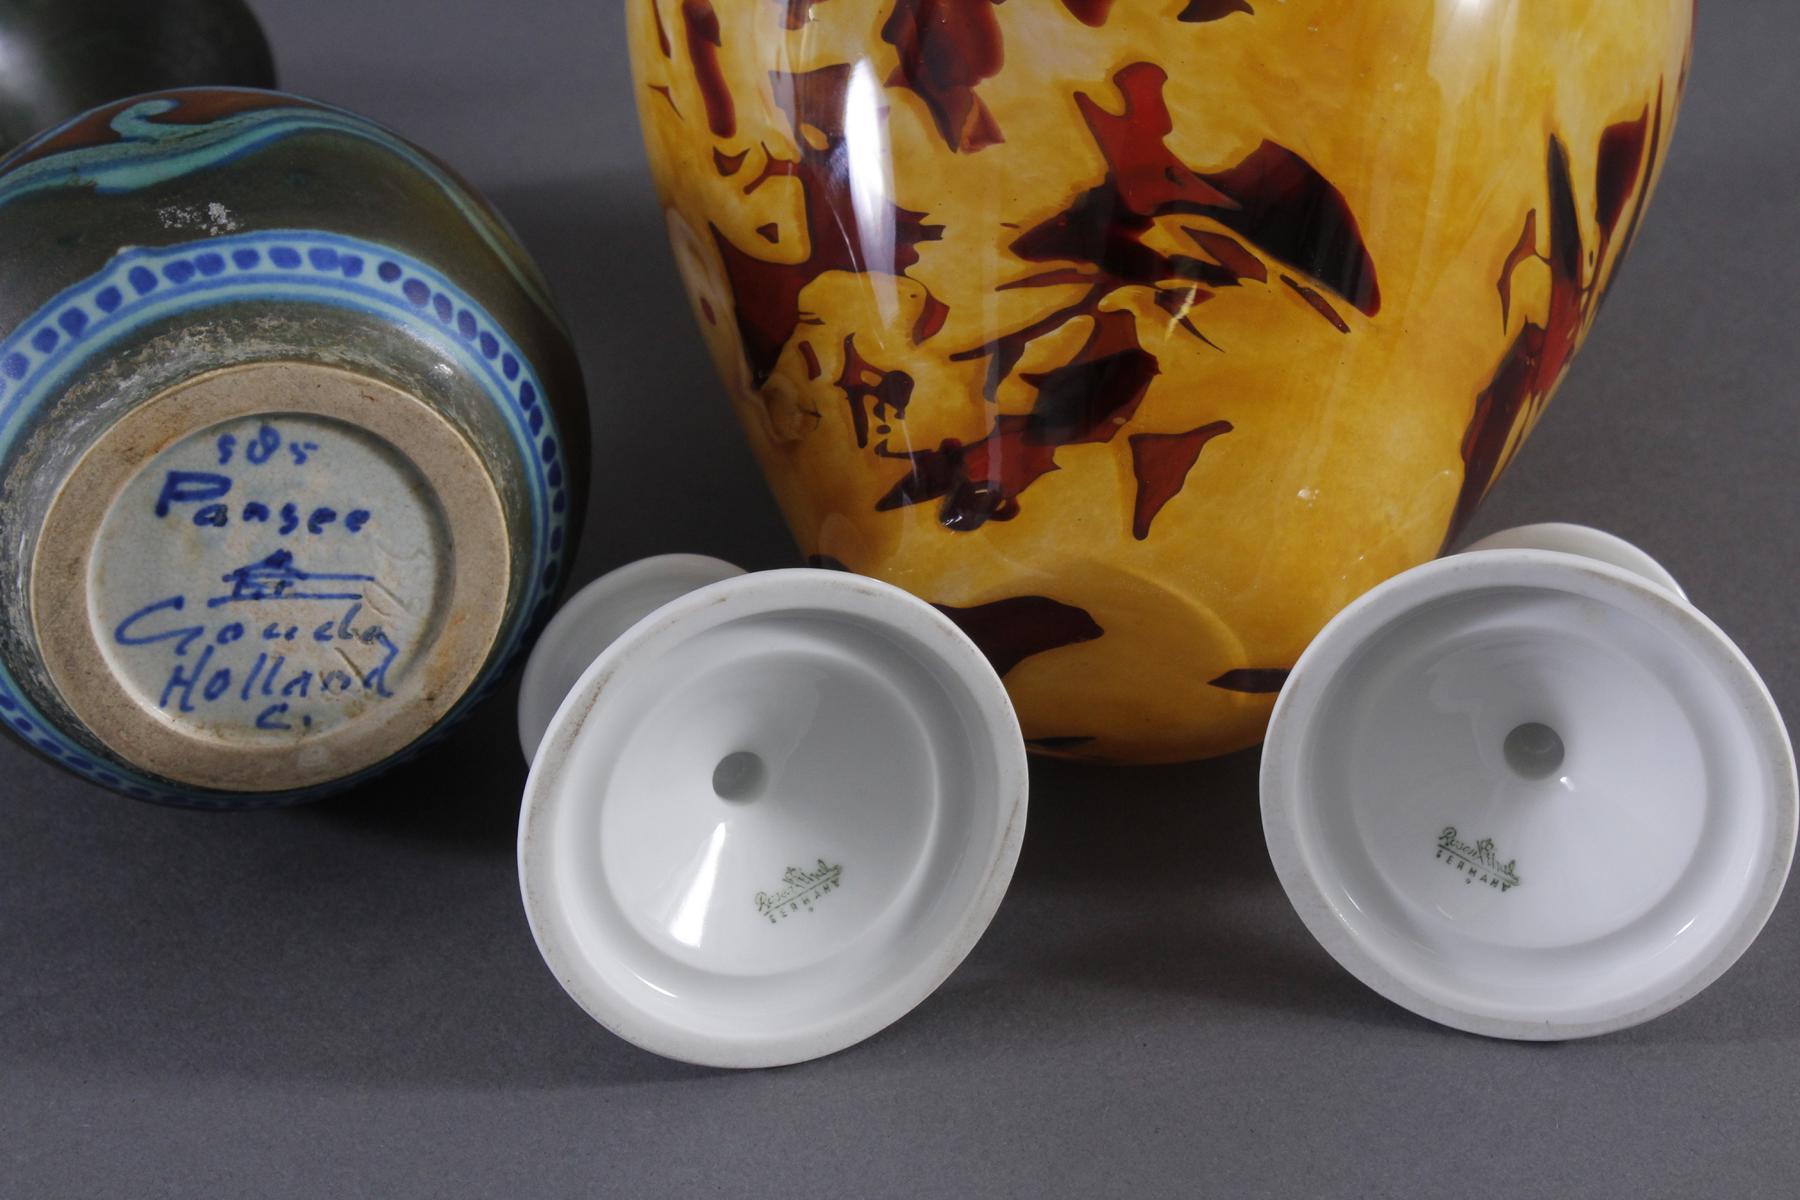 Posten Glas-Porzellan/Keramik-3